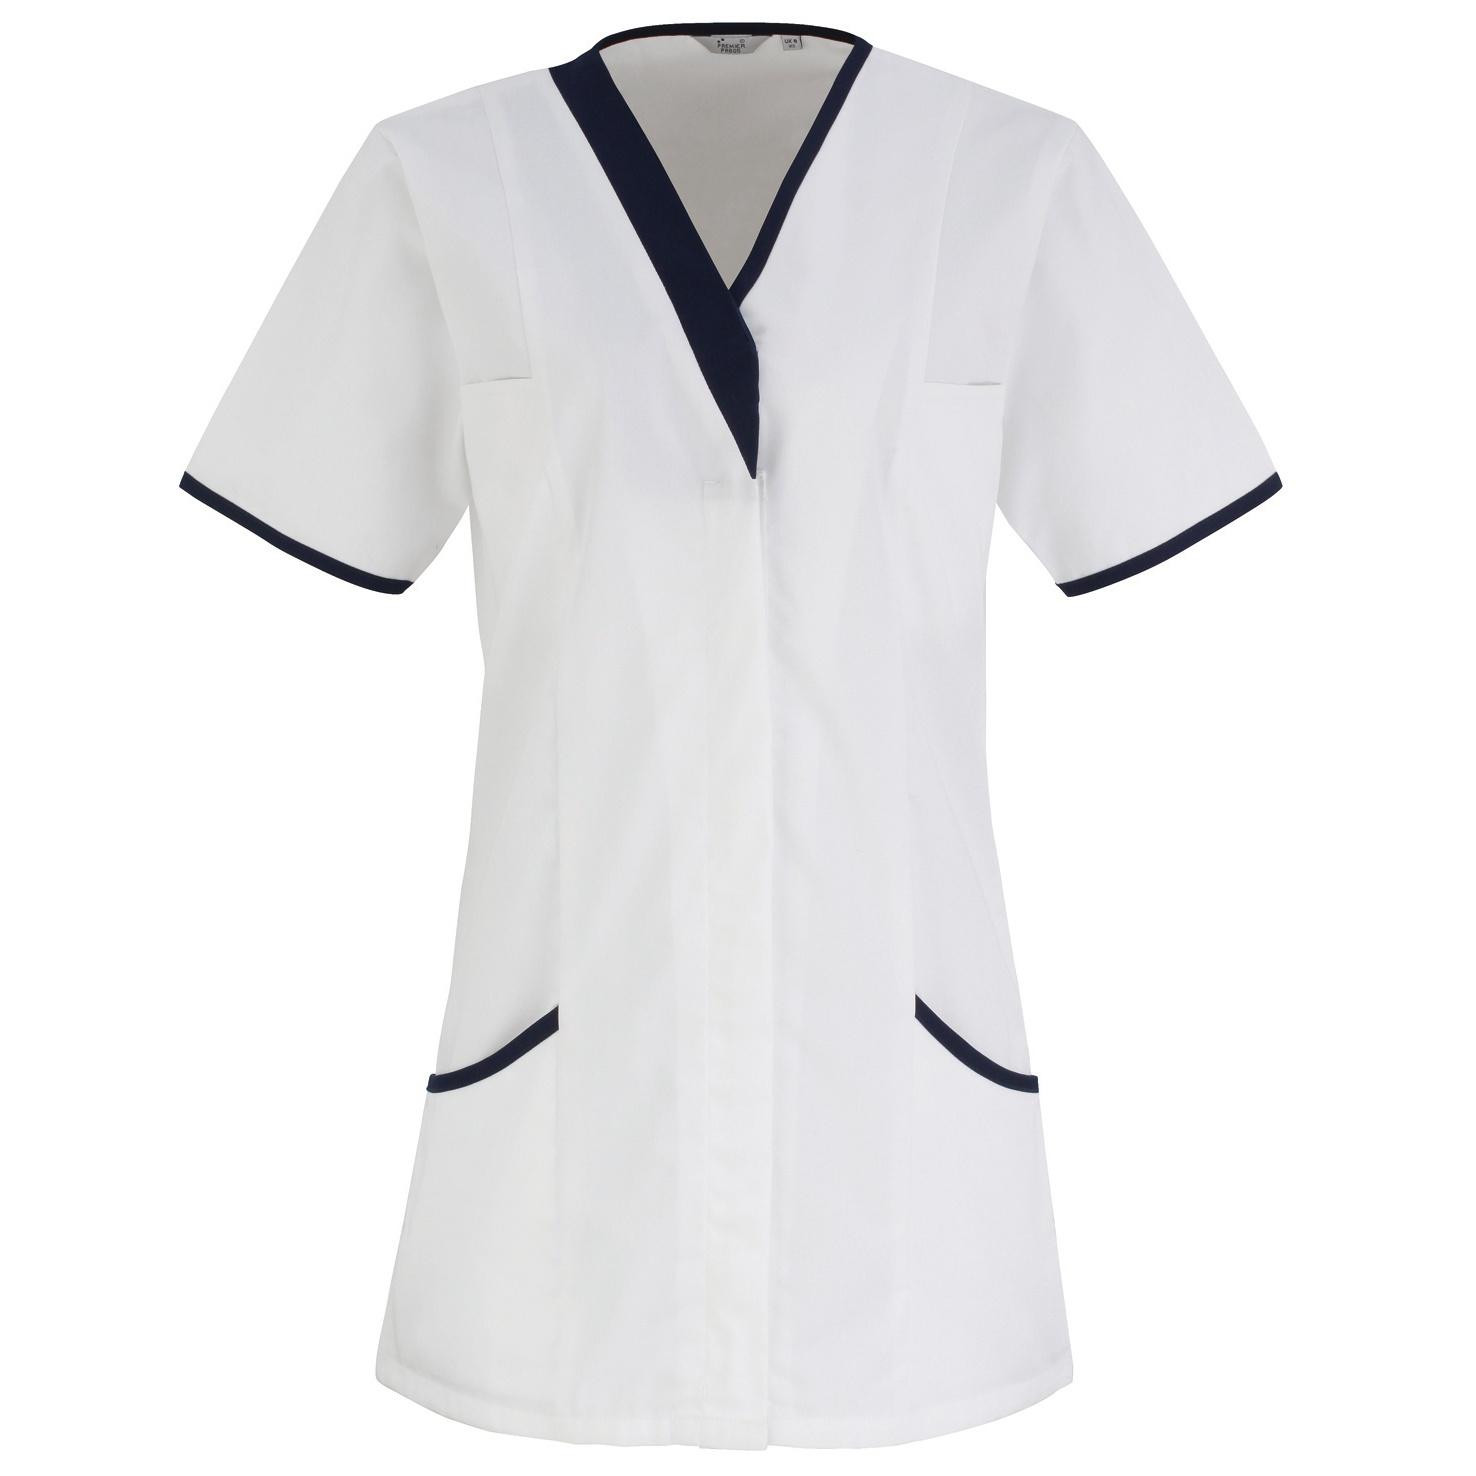 Premier Womens/Ladies Daisy Healthcare Work Tunic (Pack of 2) (20UK) (White/ Navy)